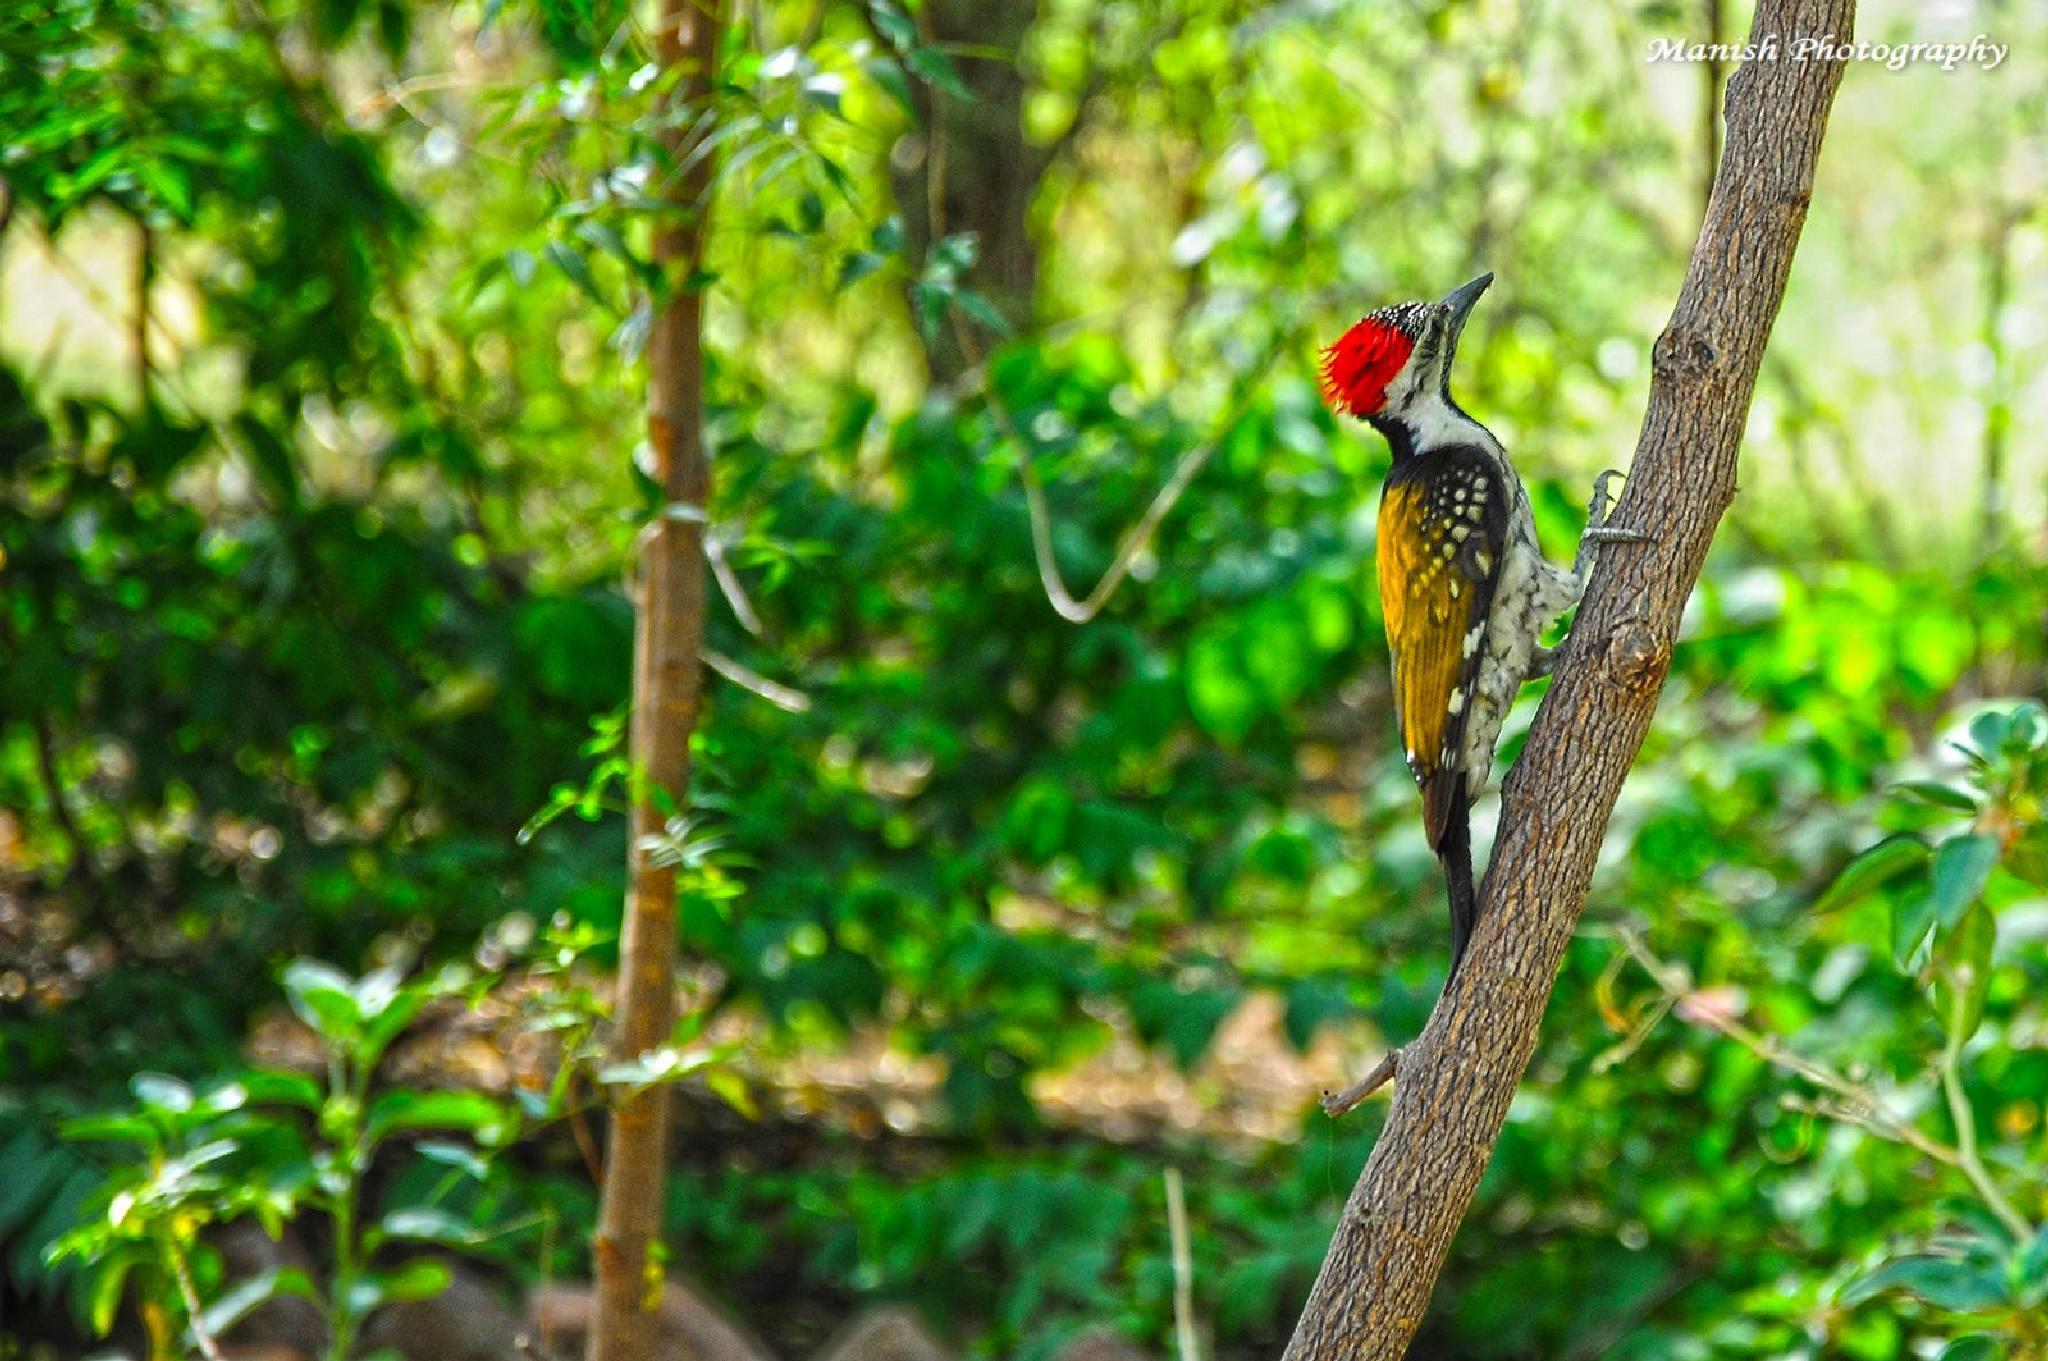 Lesser Golden-backed Woodpecker by Maneesh Sharma